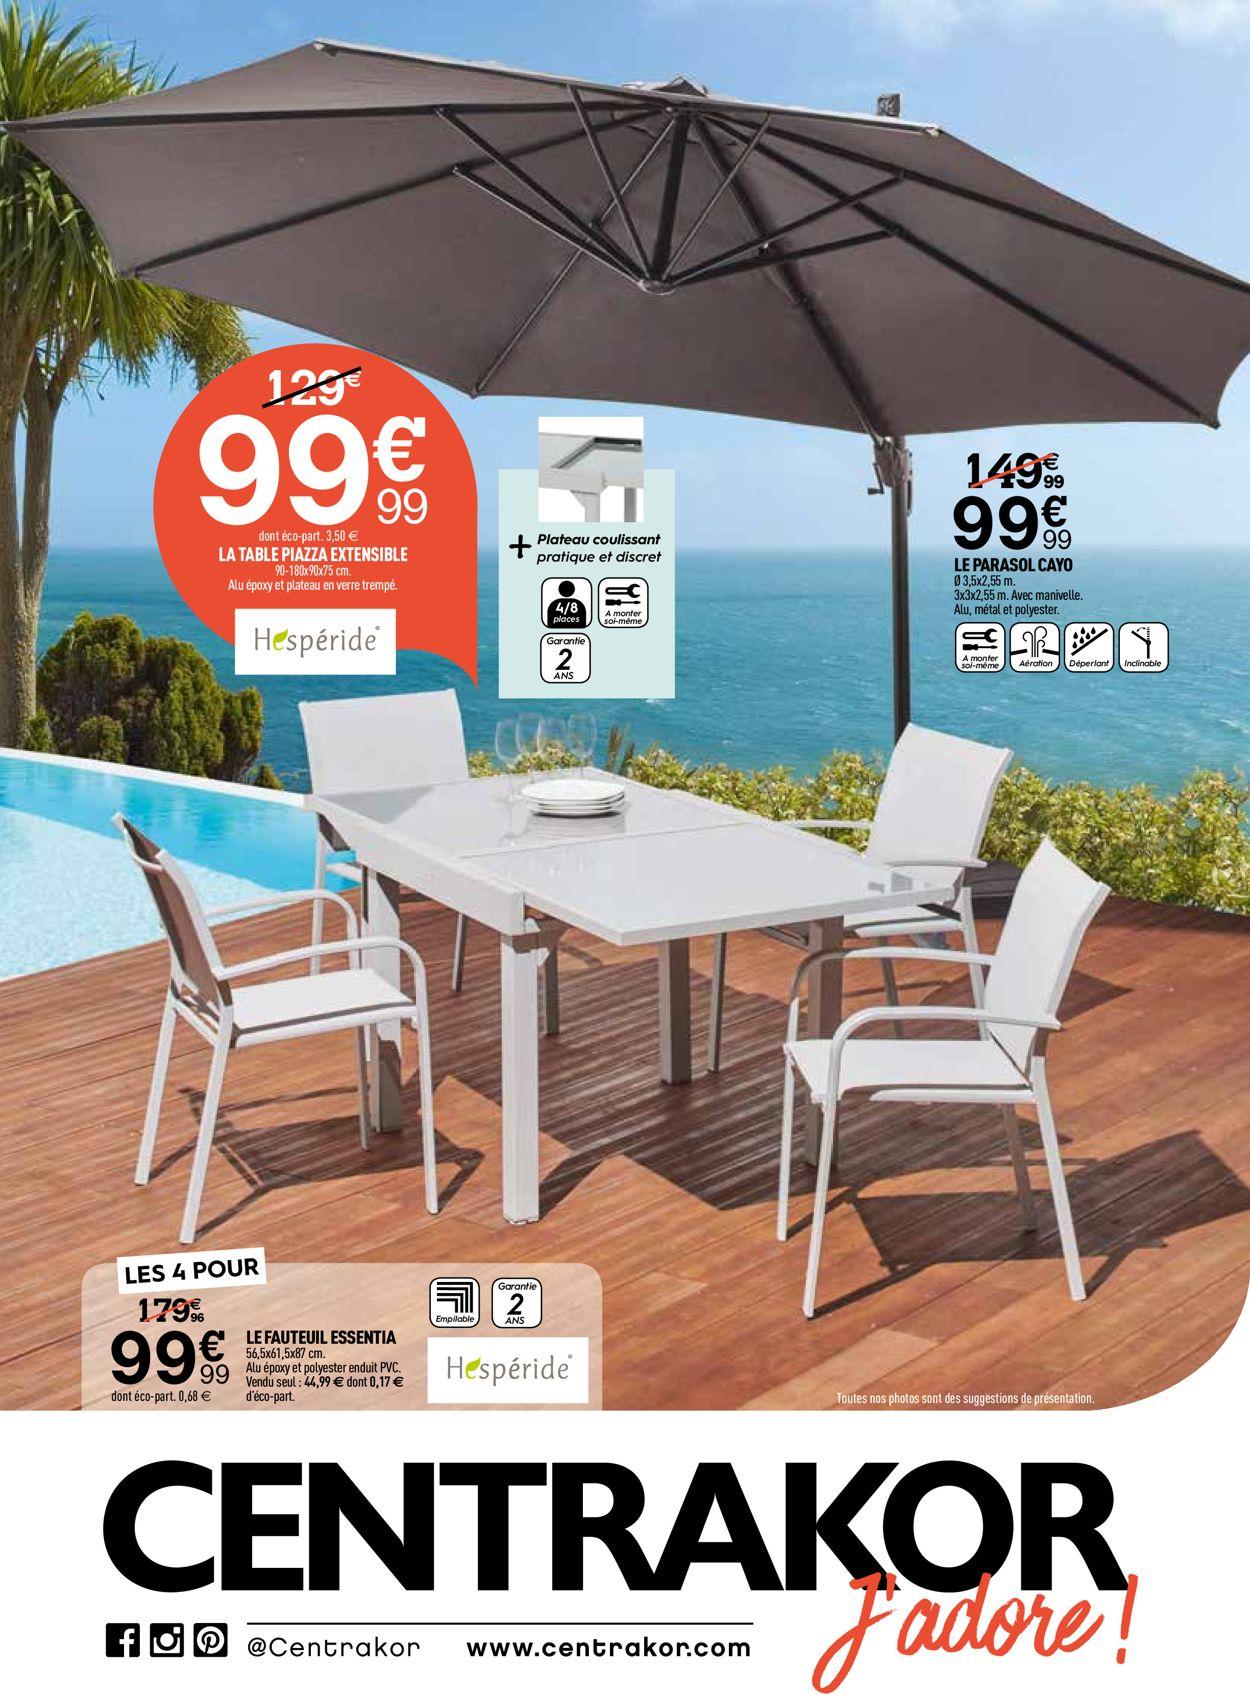 Centrakor Catalogue Actuel 25.05 - 30.06.2020 - Catalogue-24 serapportantà Table Hespéride Piazza Centrakor